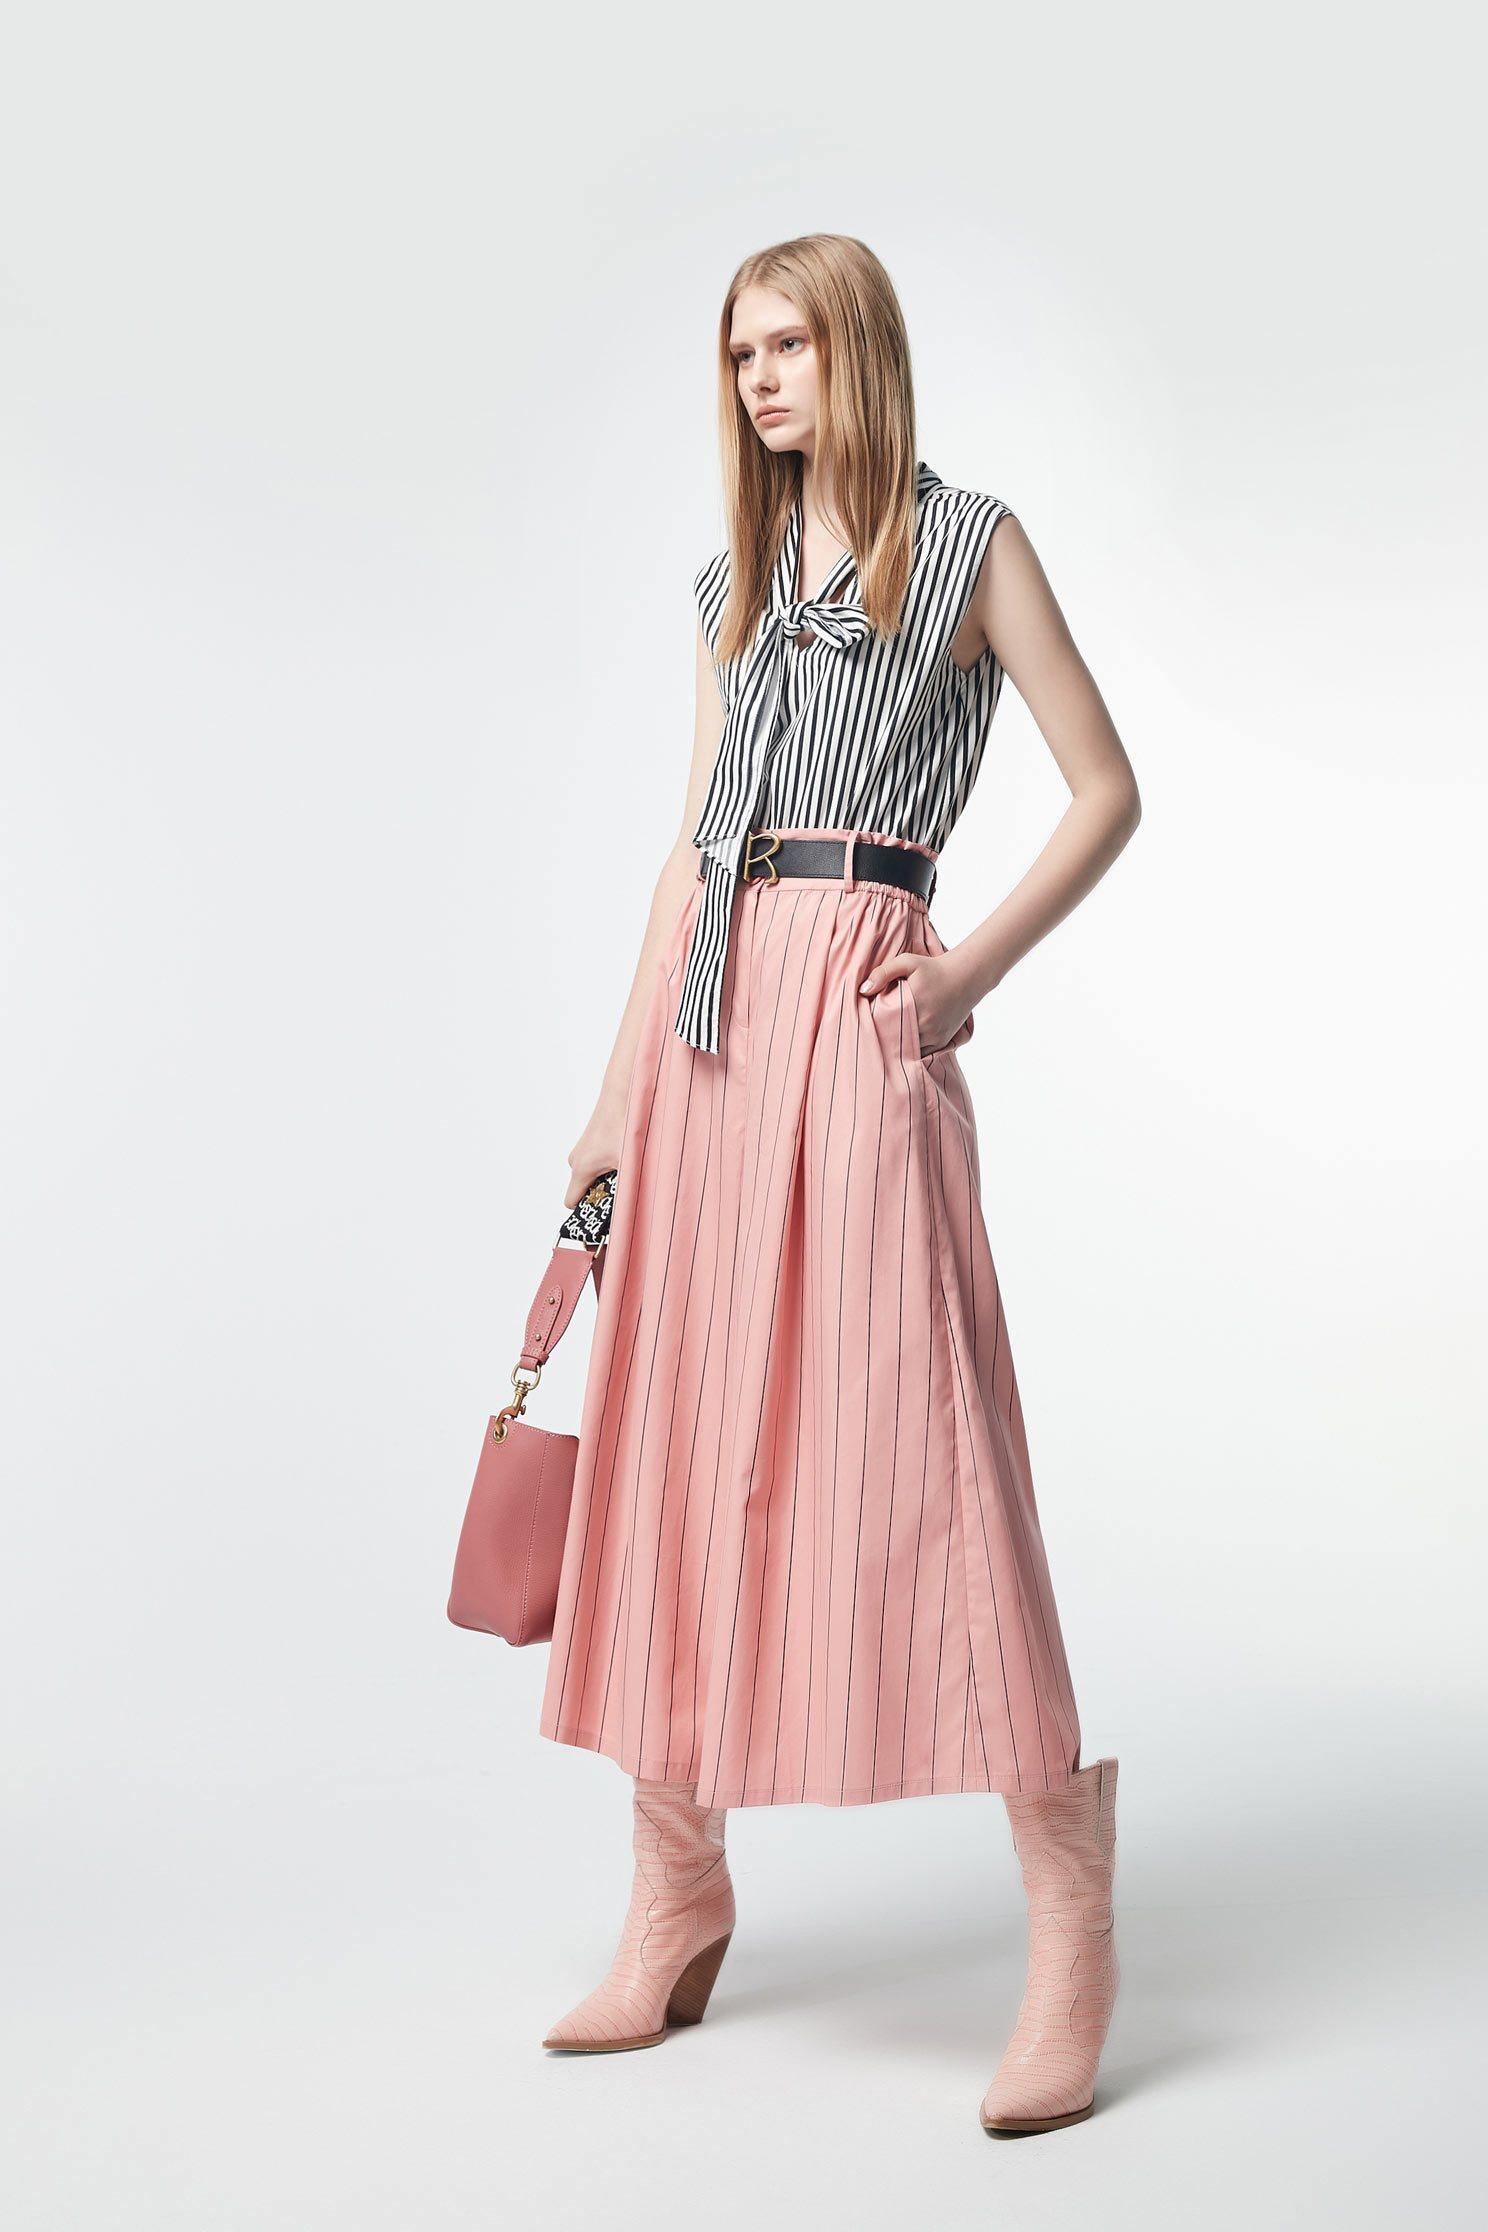 Striped culottes,Cropped wide pants,culottespants,i-select,pants,culottes,girlfriendsspringtour